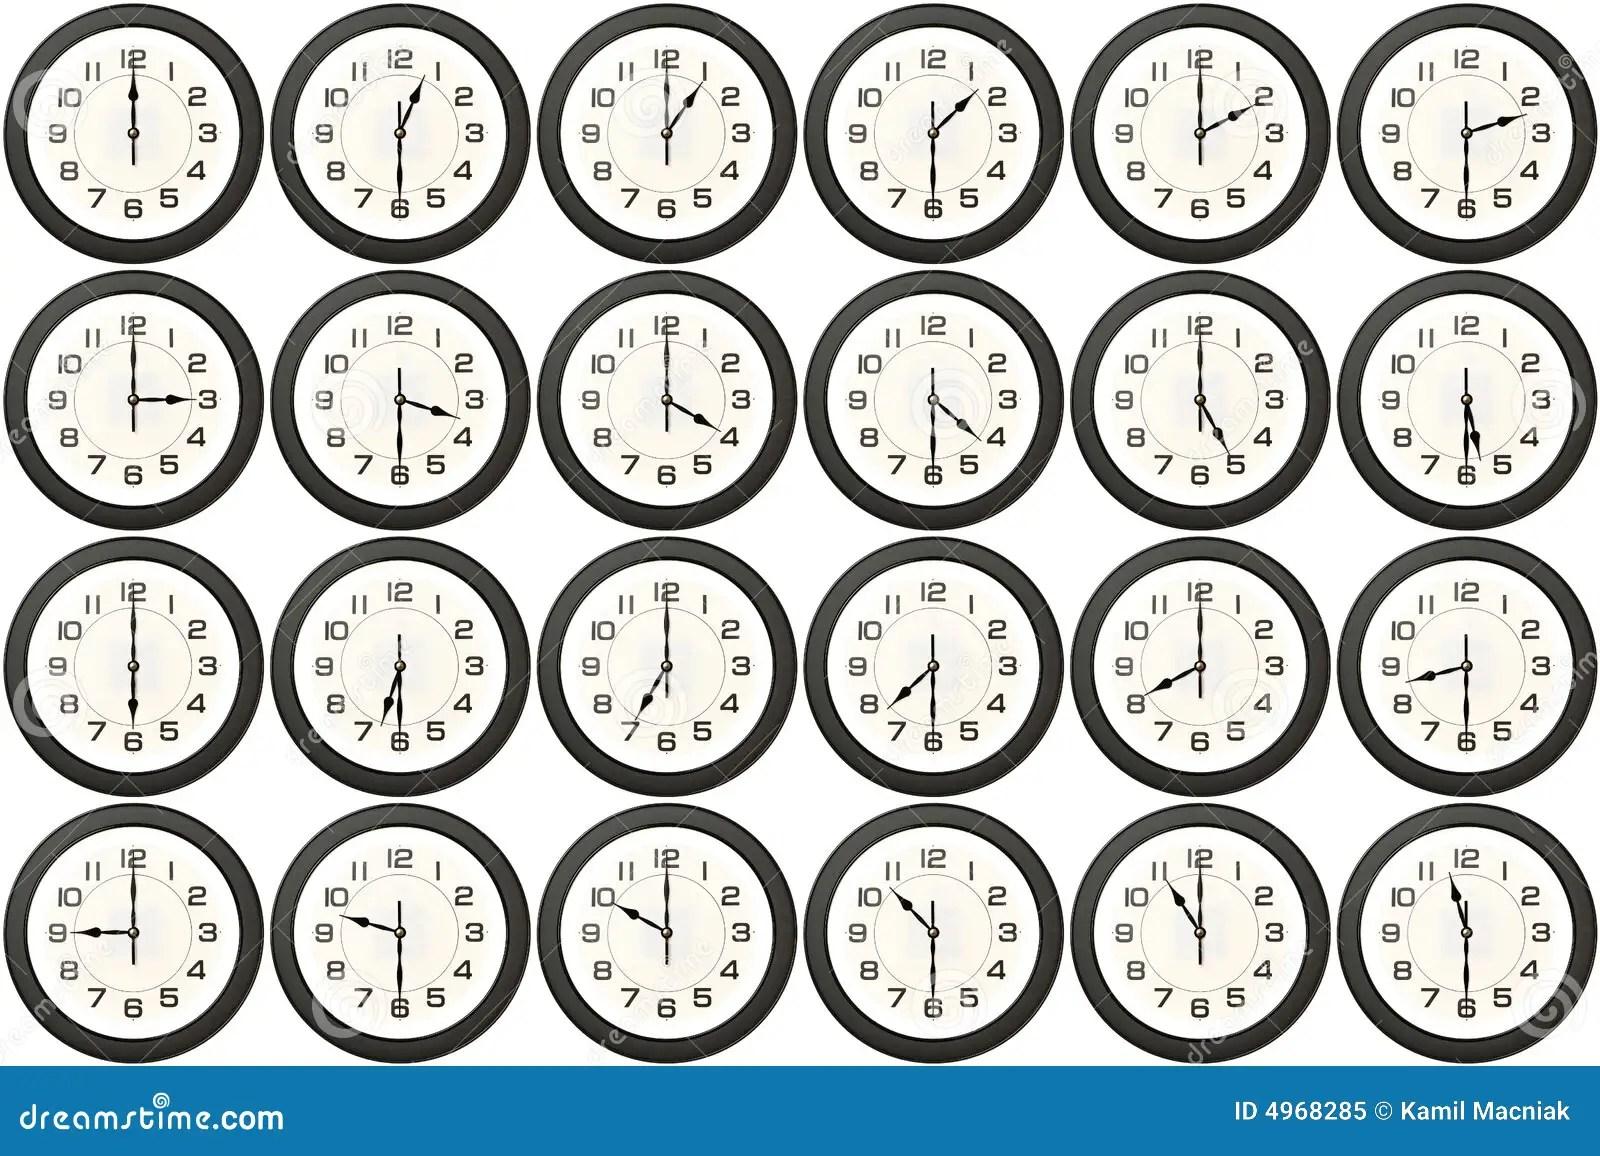 24 Clocks Every Half Hour Royalty Free Stock Photo